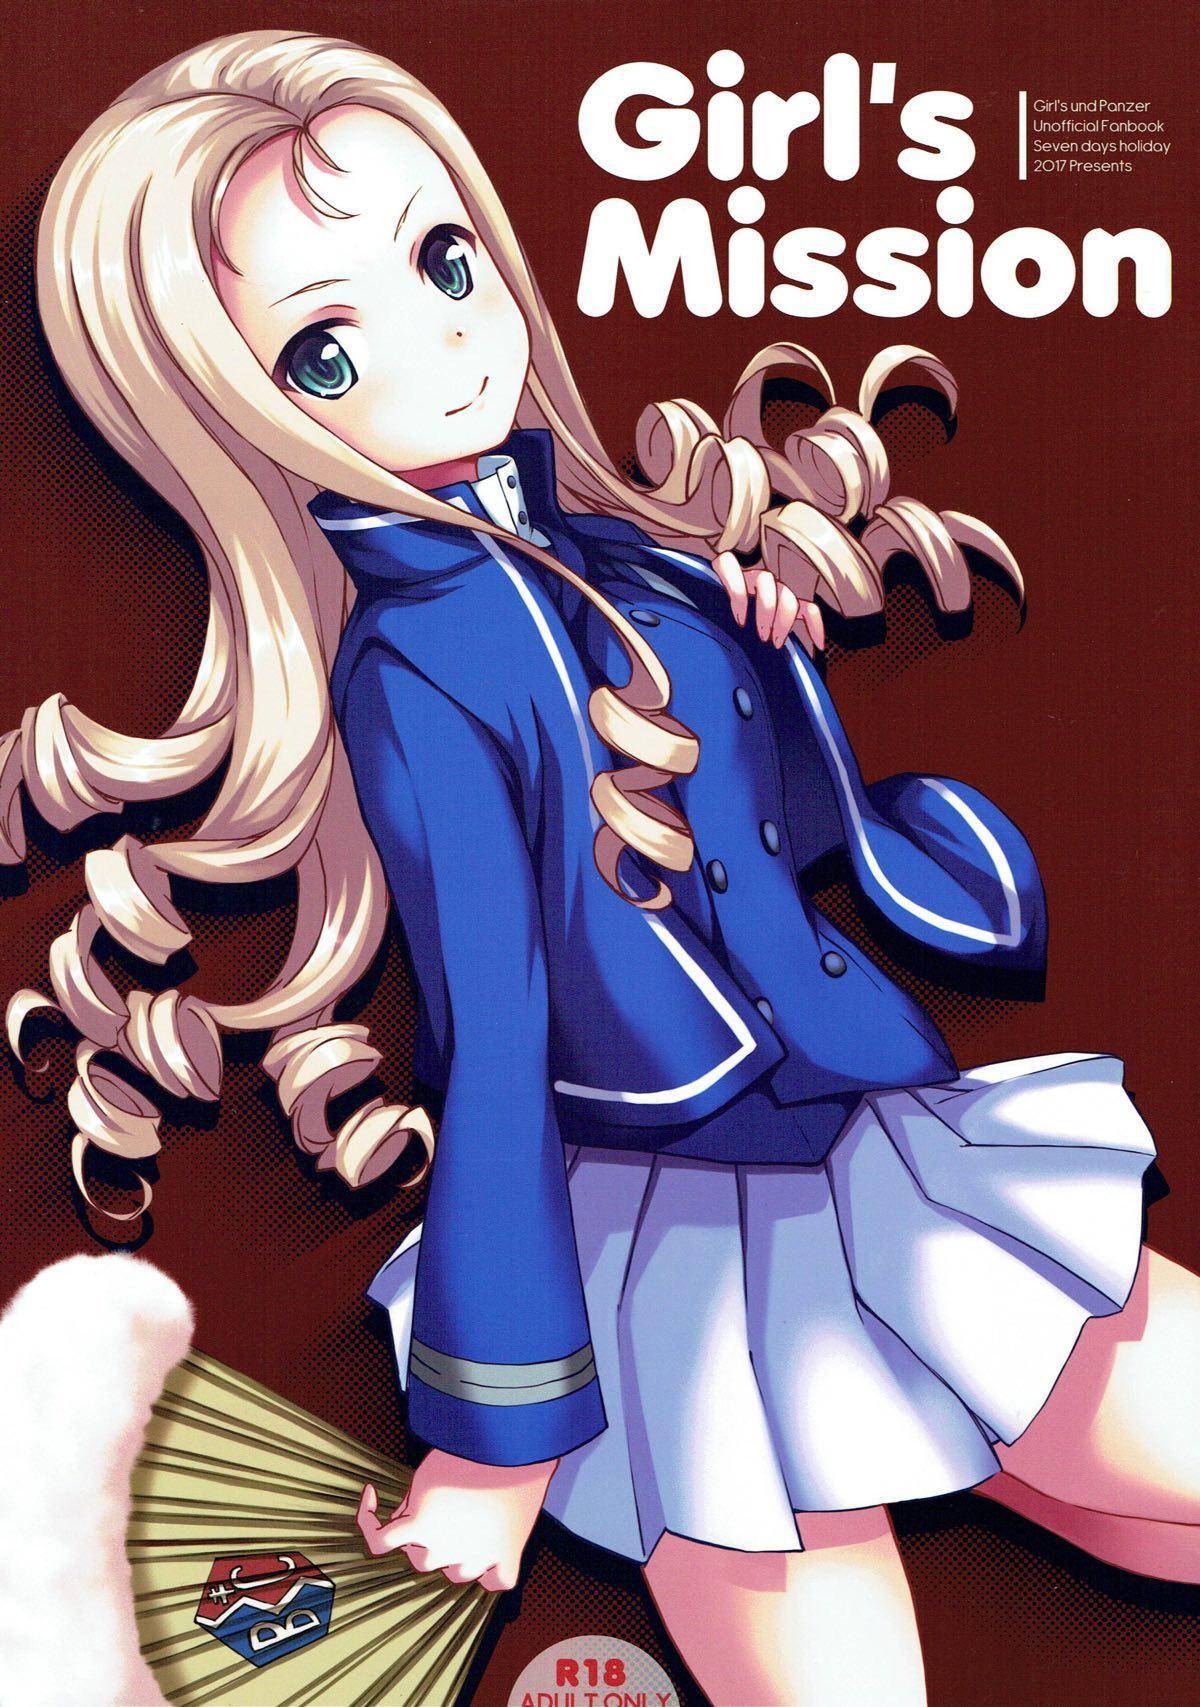 Girl's Mission 0